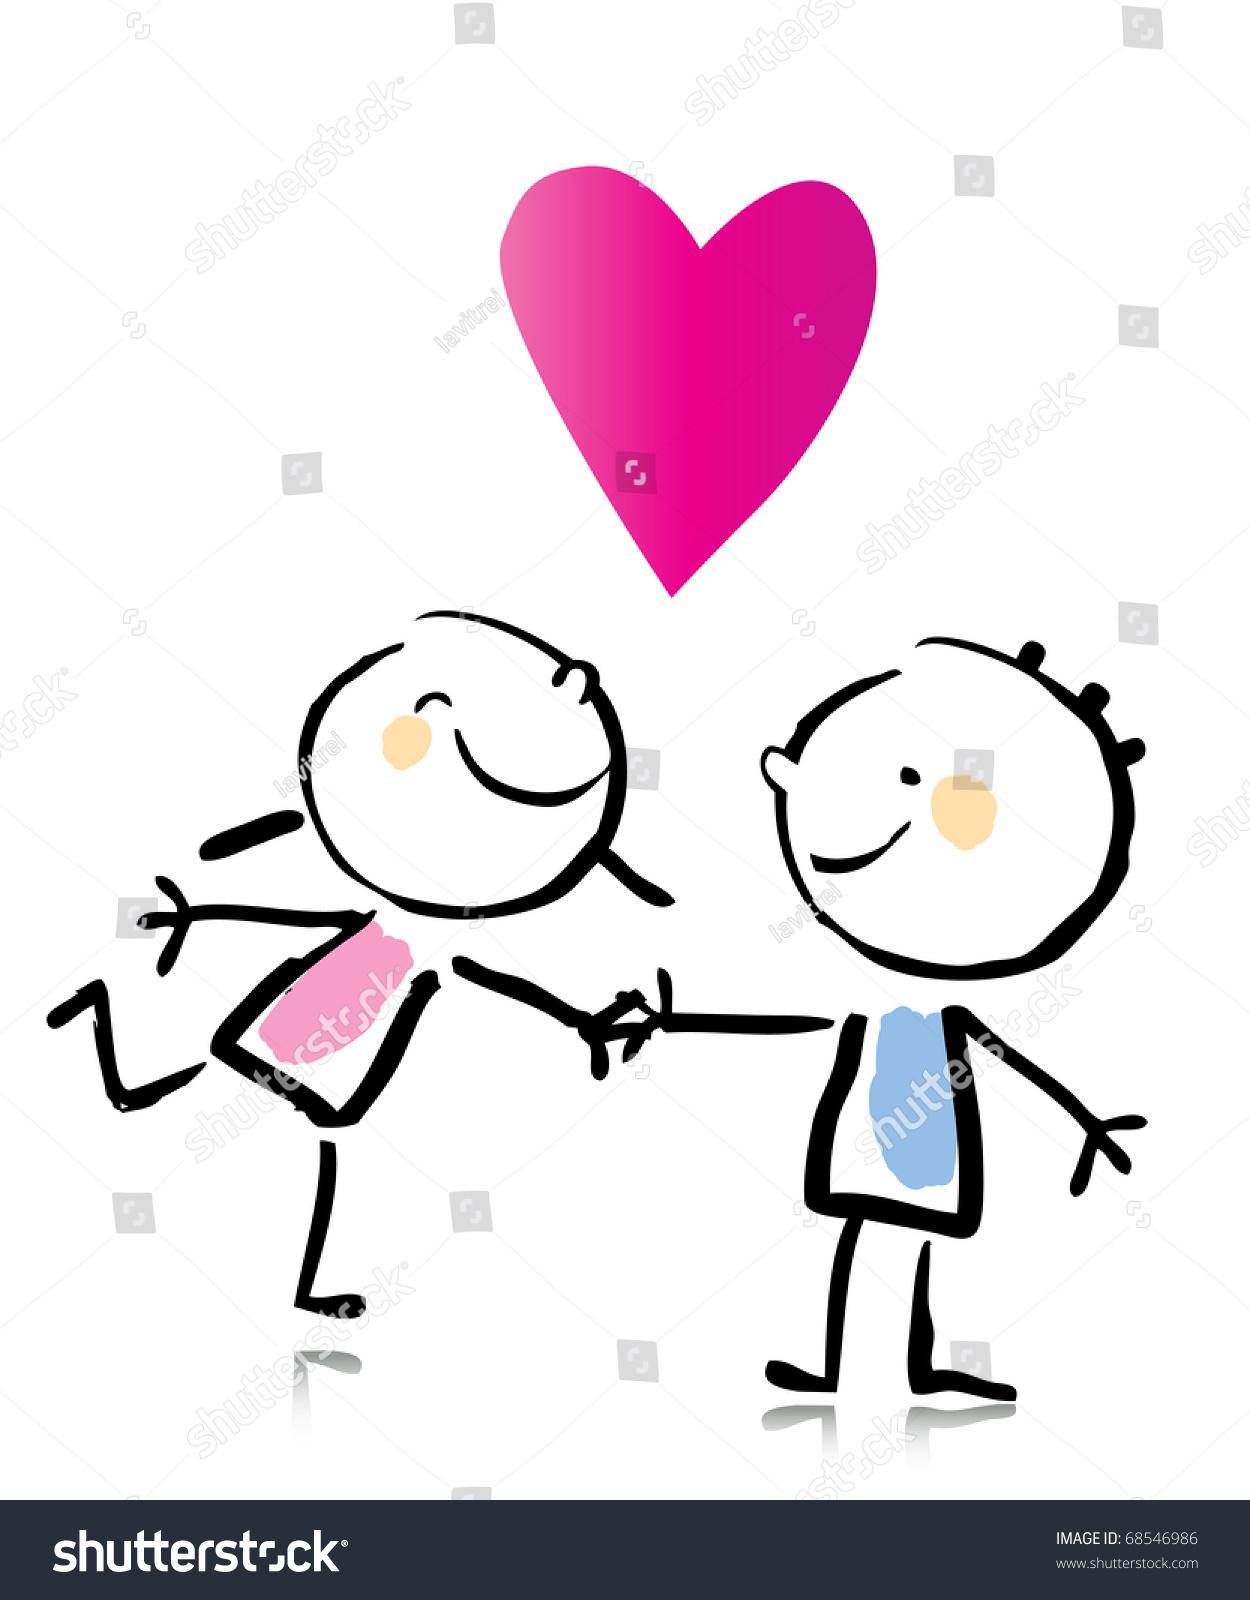 1250x1600 Cartoon Drawings Of People In Love Valentines Day Cartoon Romantic